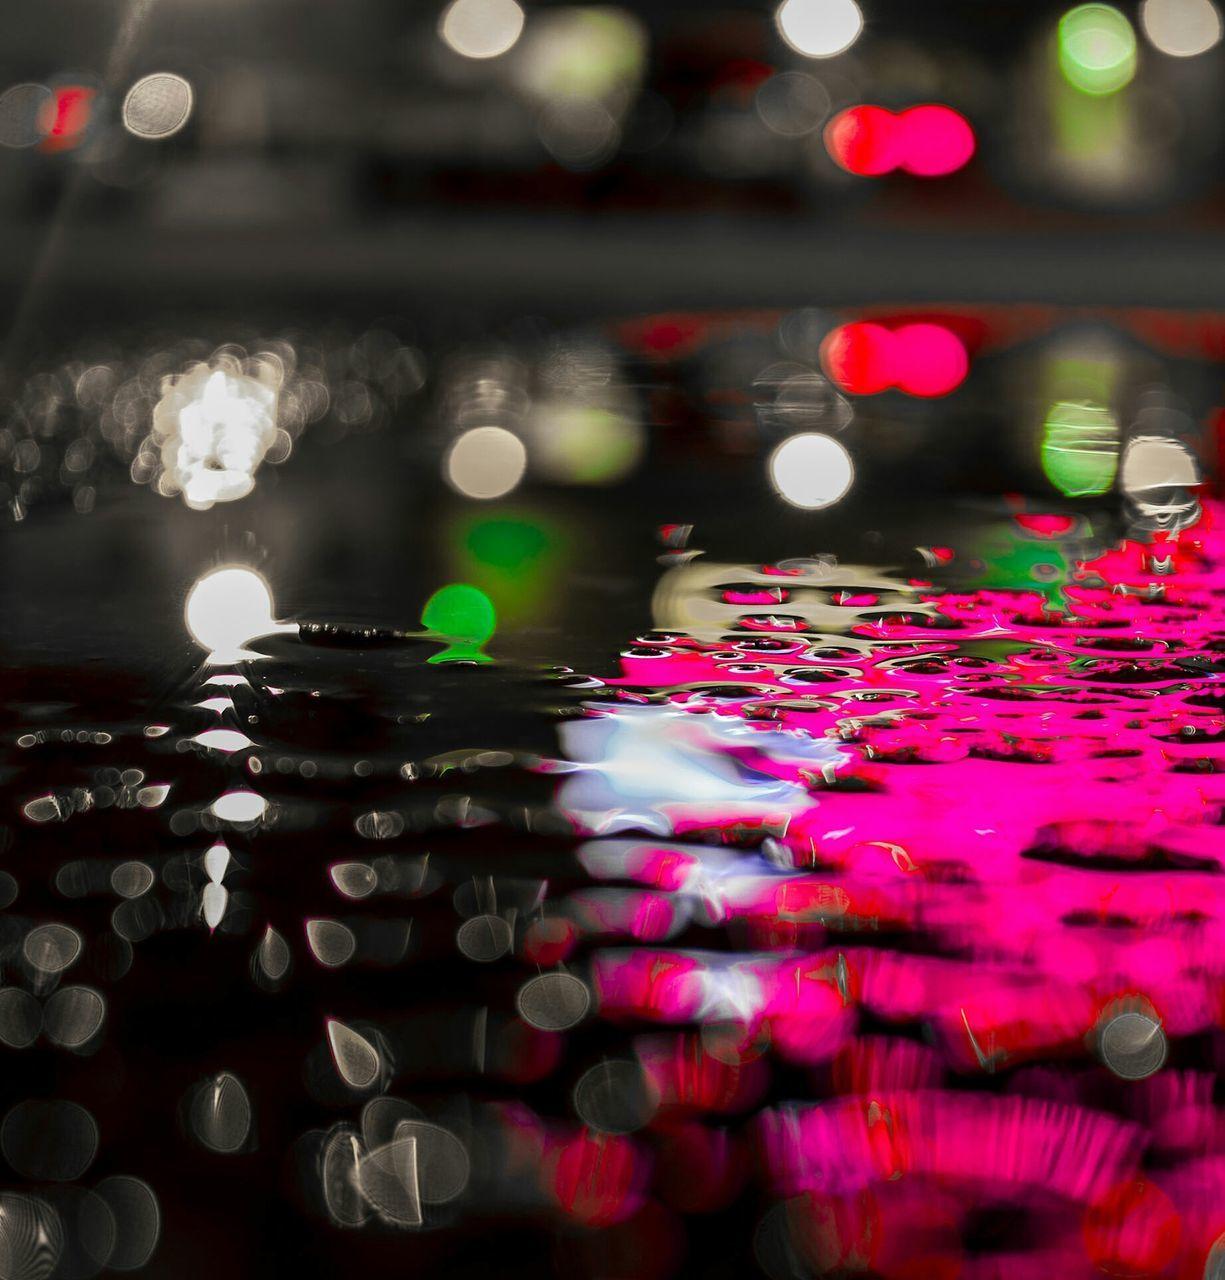 illuminated, water, no people, night, close-up, multi colored, indoors, nature, freshness